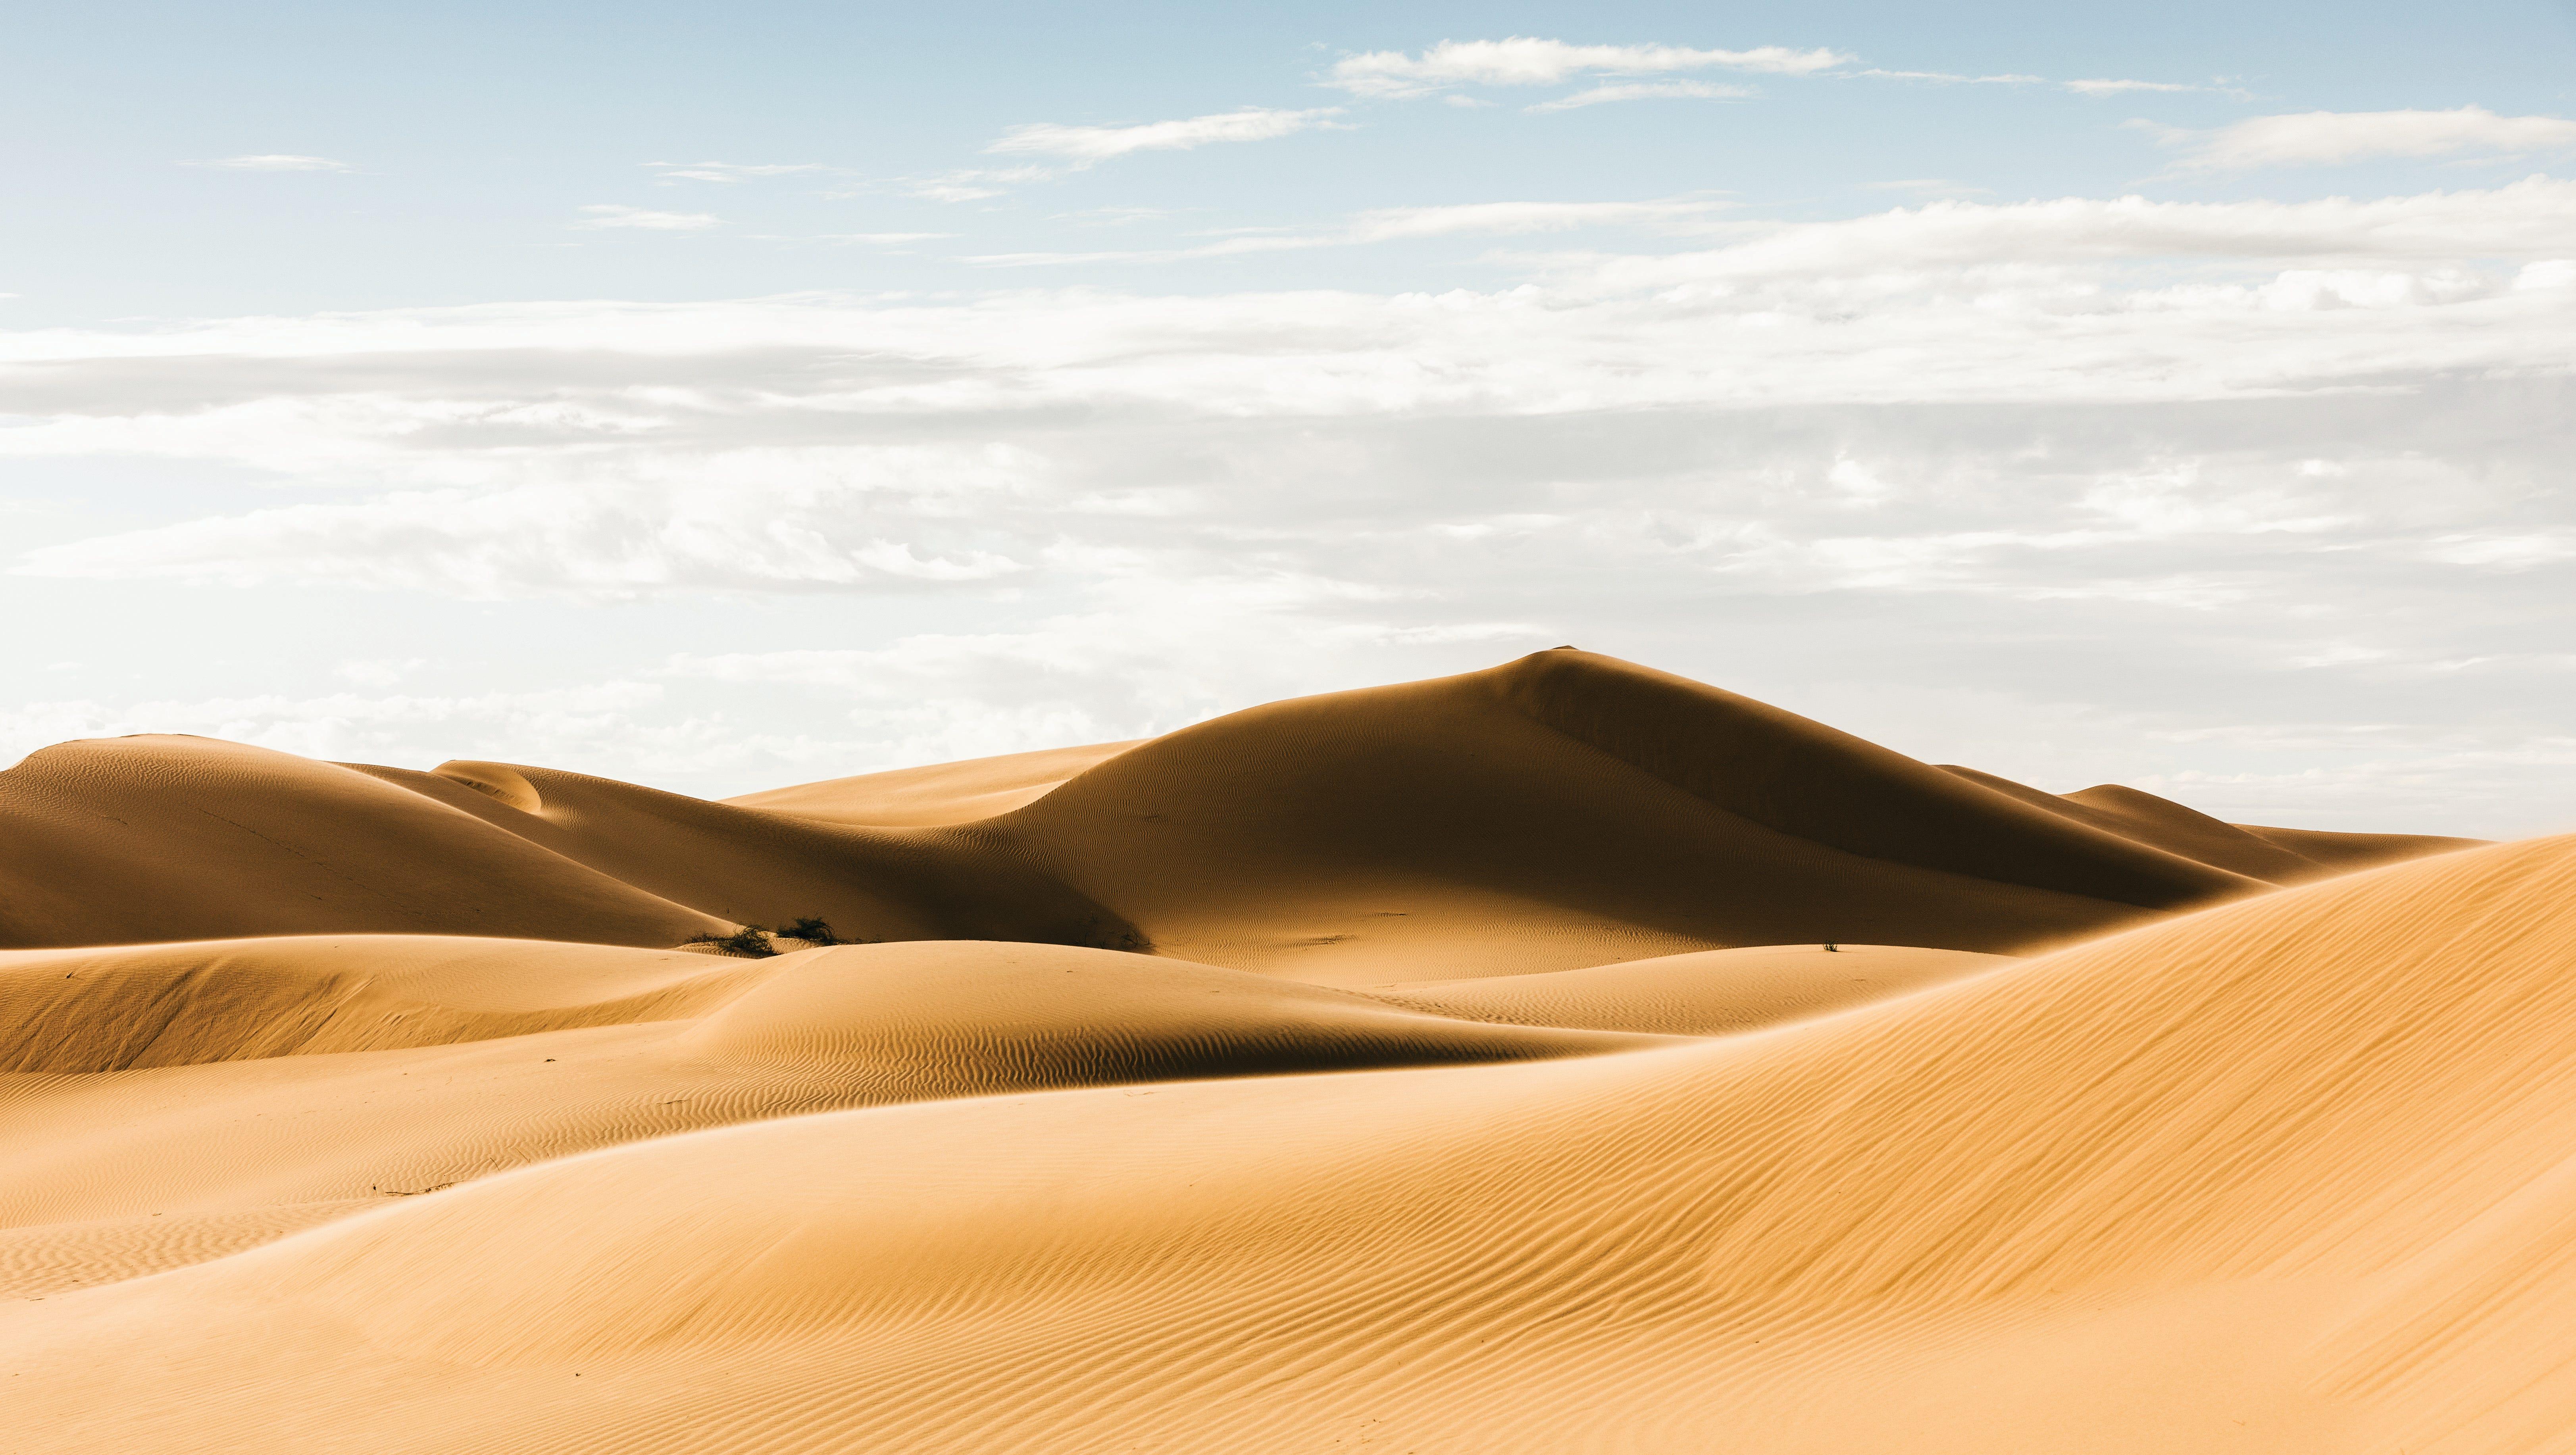 Imperial Sand Dunes A larger than life adult sandbox